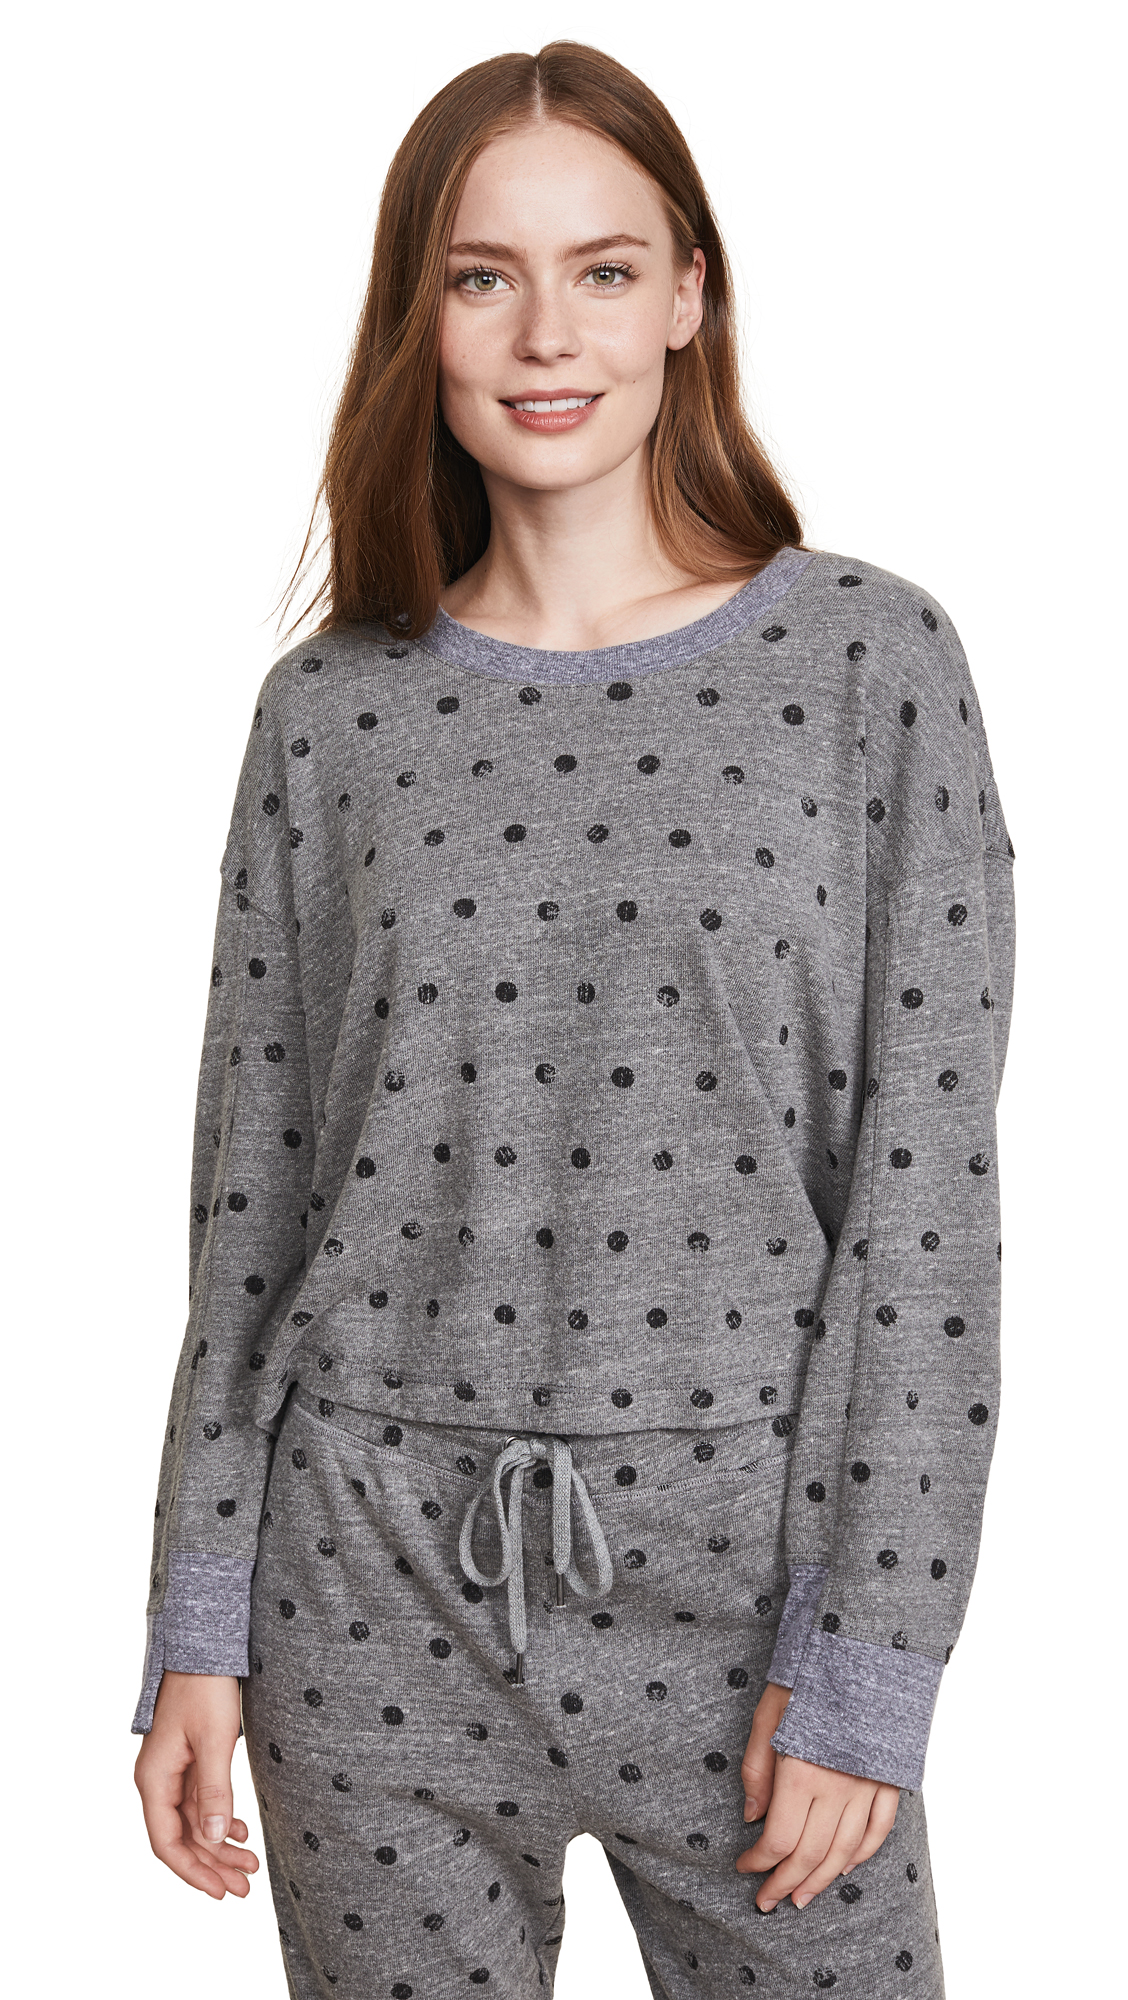 Splendid Paint Dot Sweatshirt In Heather Grey